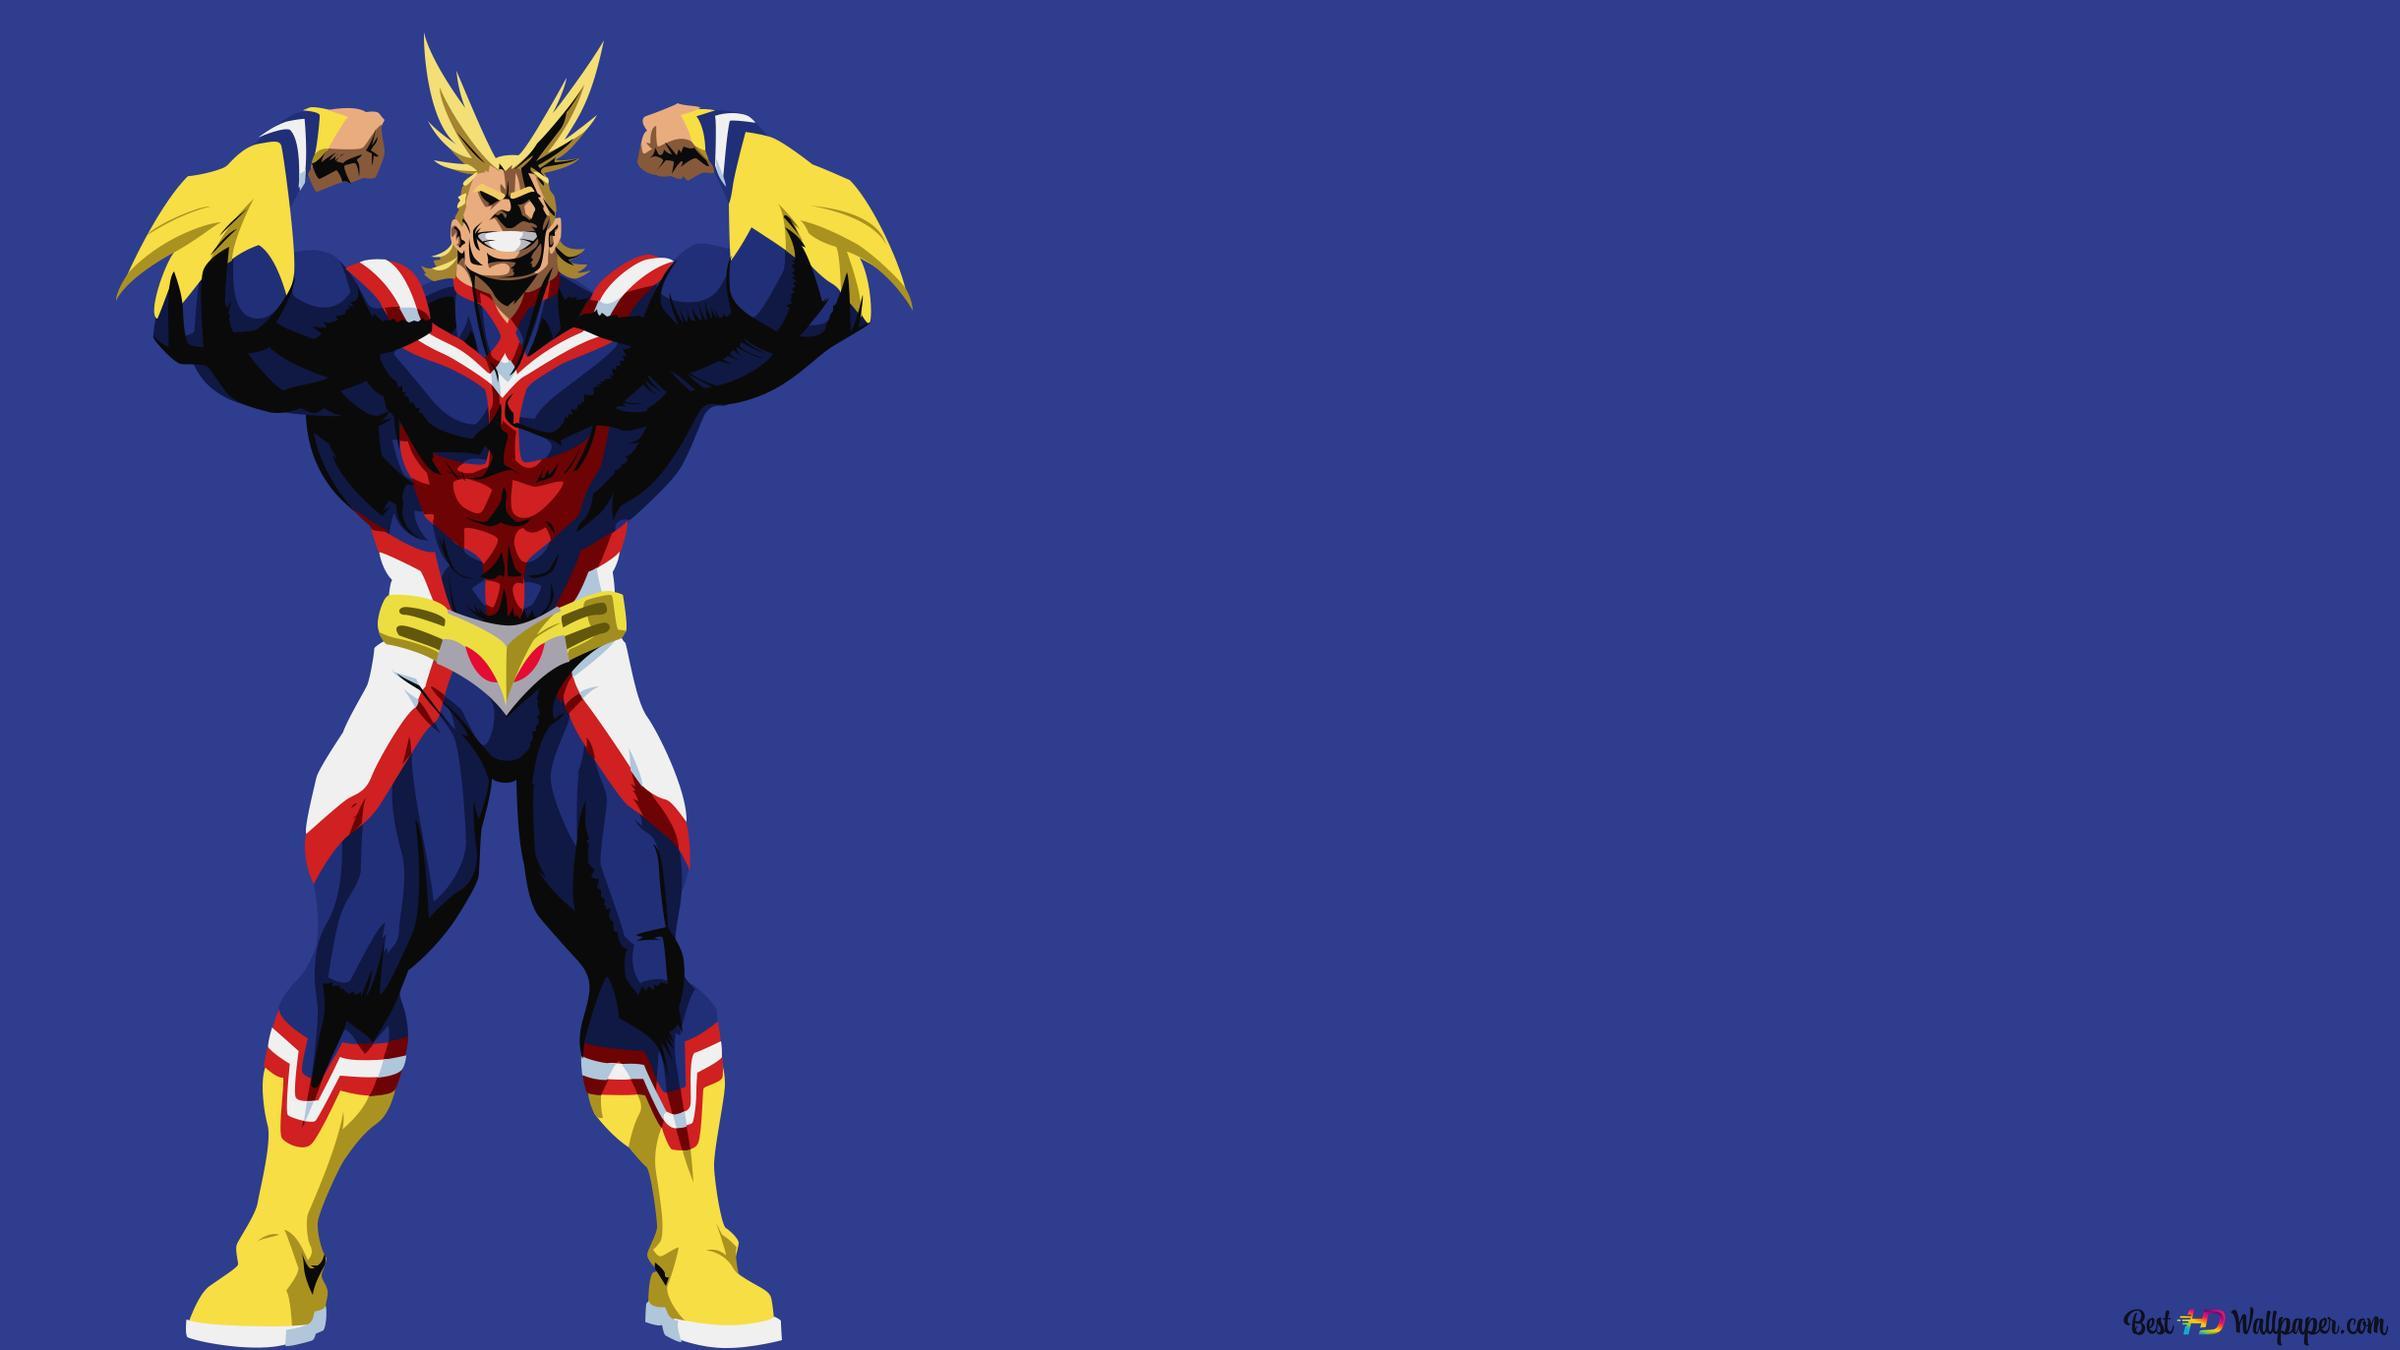 My Hero Academia All Might Minimalist Hd Wallpaper Download